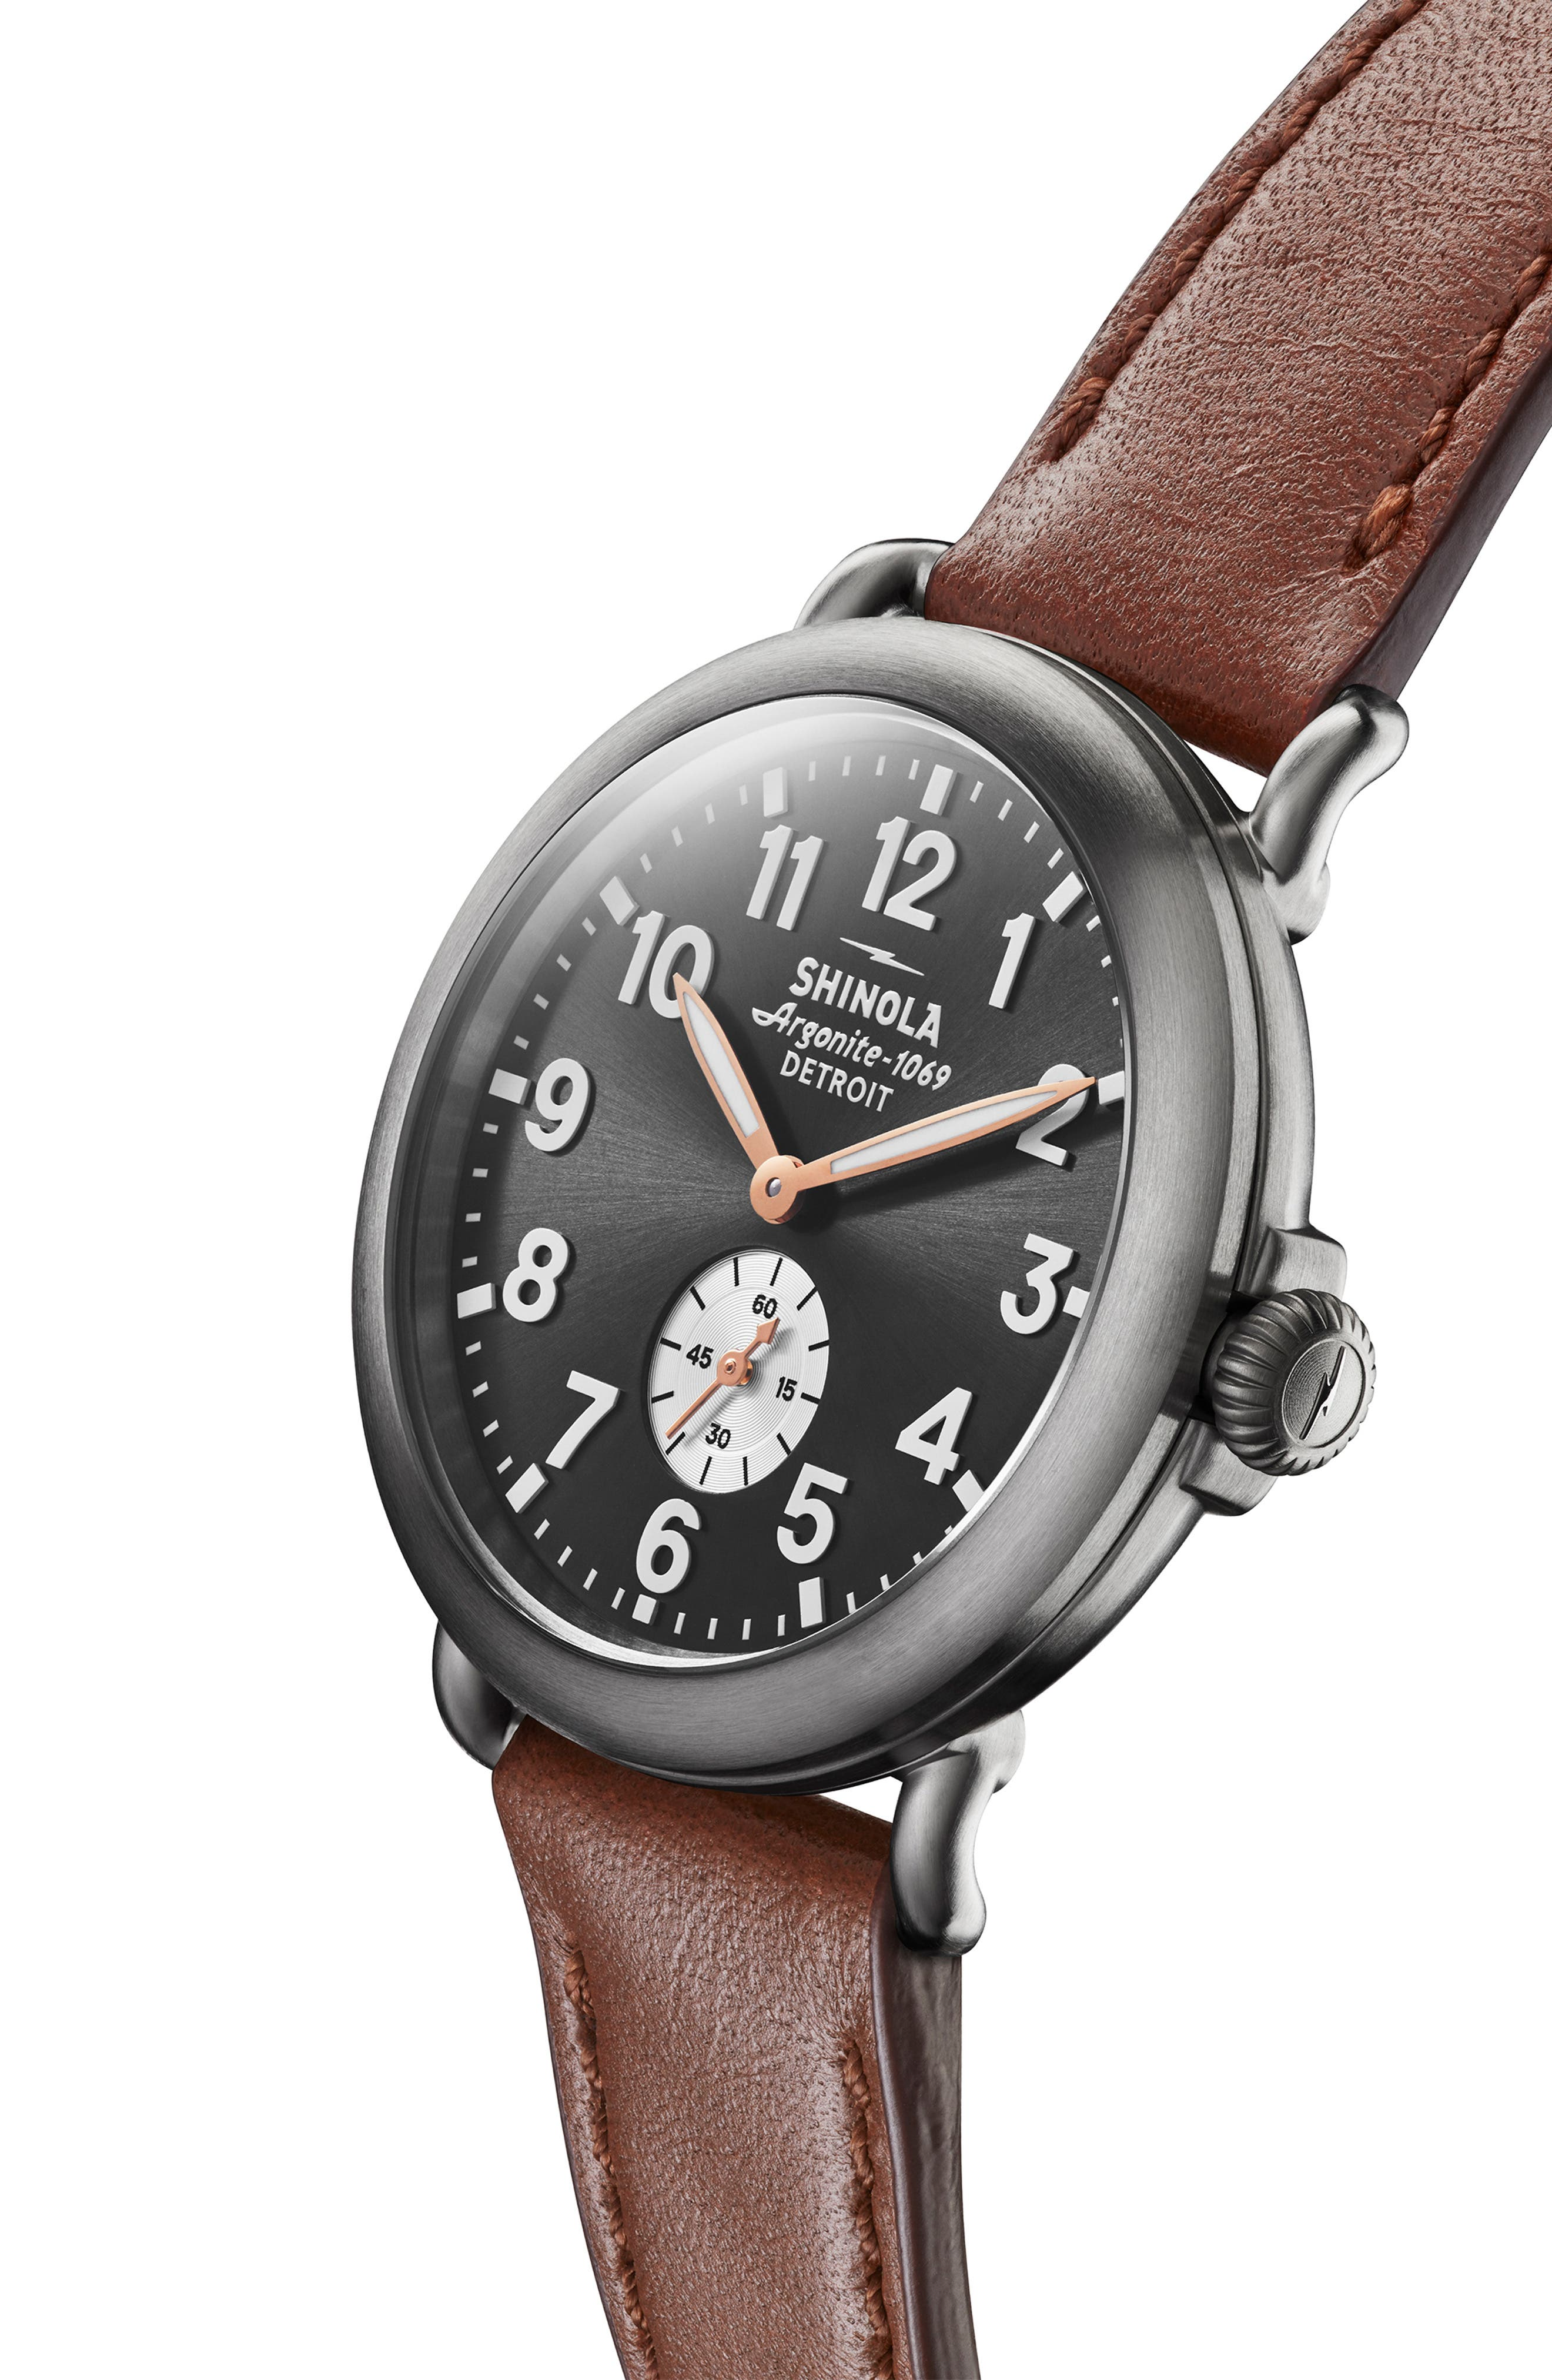 SHINOLA, 'The Runwell' Leather Strap Watch, 41mm, Alternate thumbnail 4, color, DARK COGNAC/ GUNMETAL/ GREY